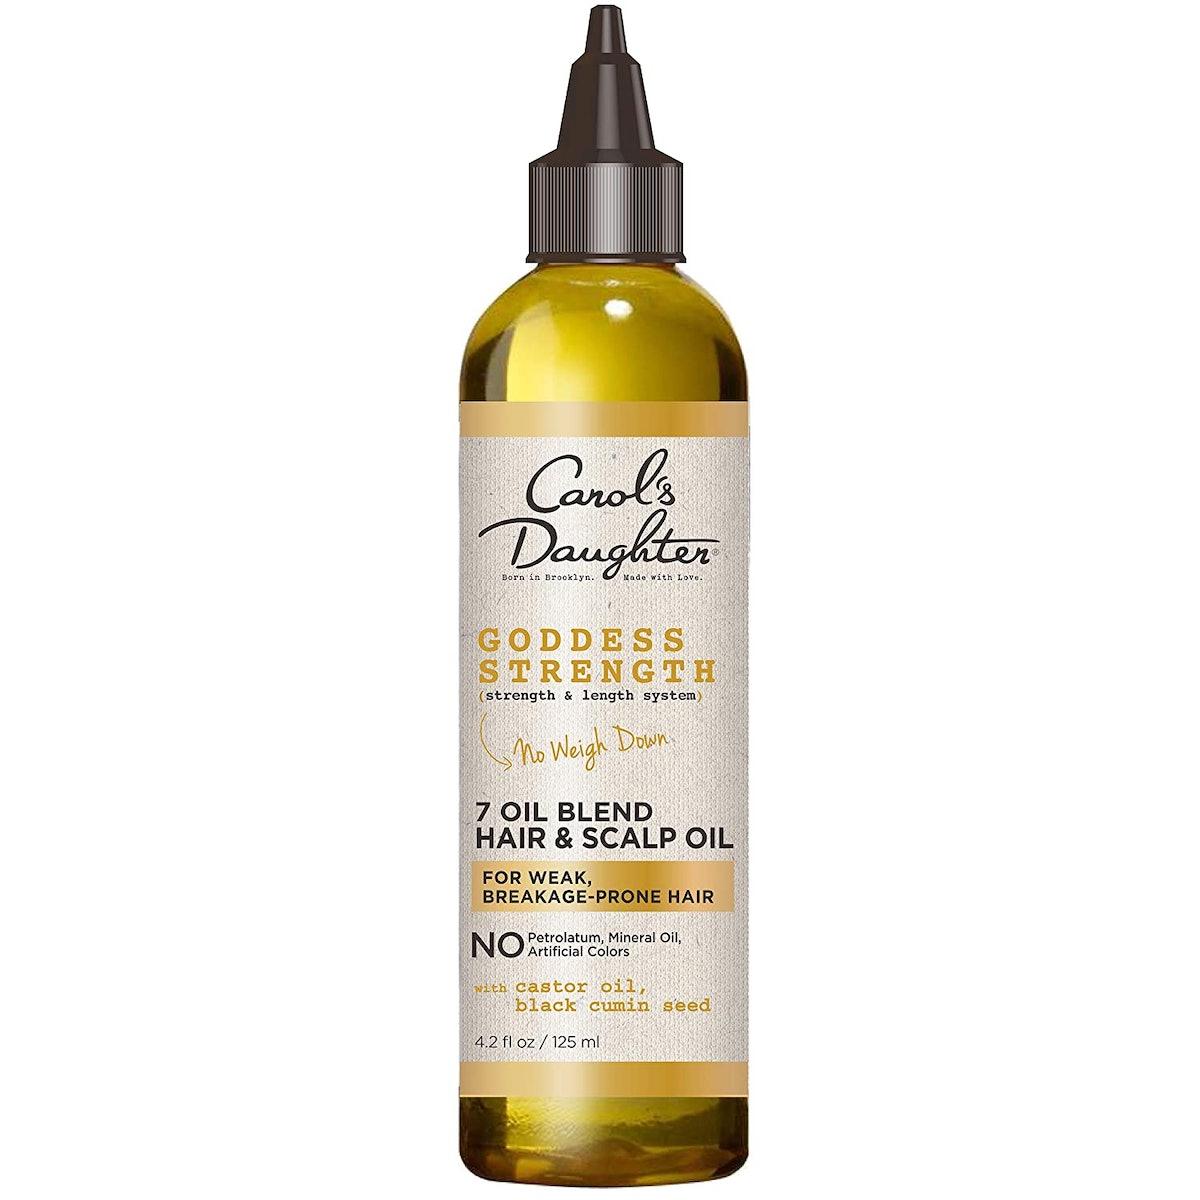 Carol's Daughter 7 Oil Blend Scalp Oil